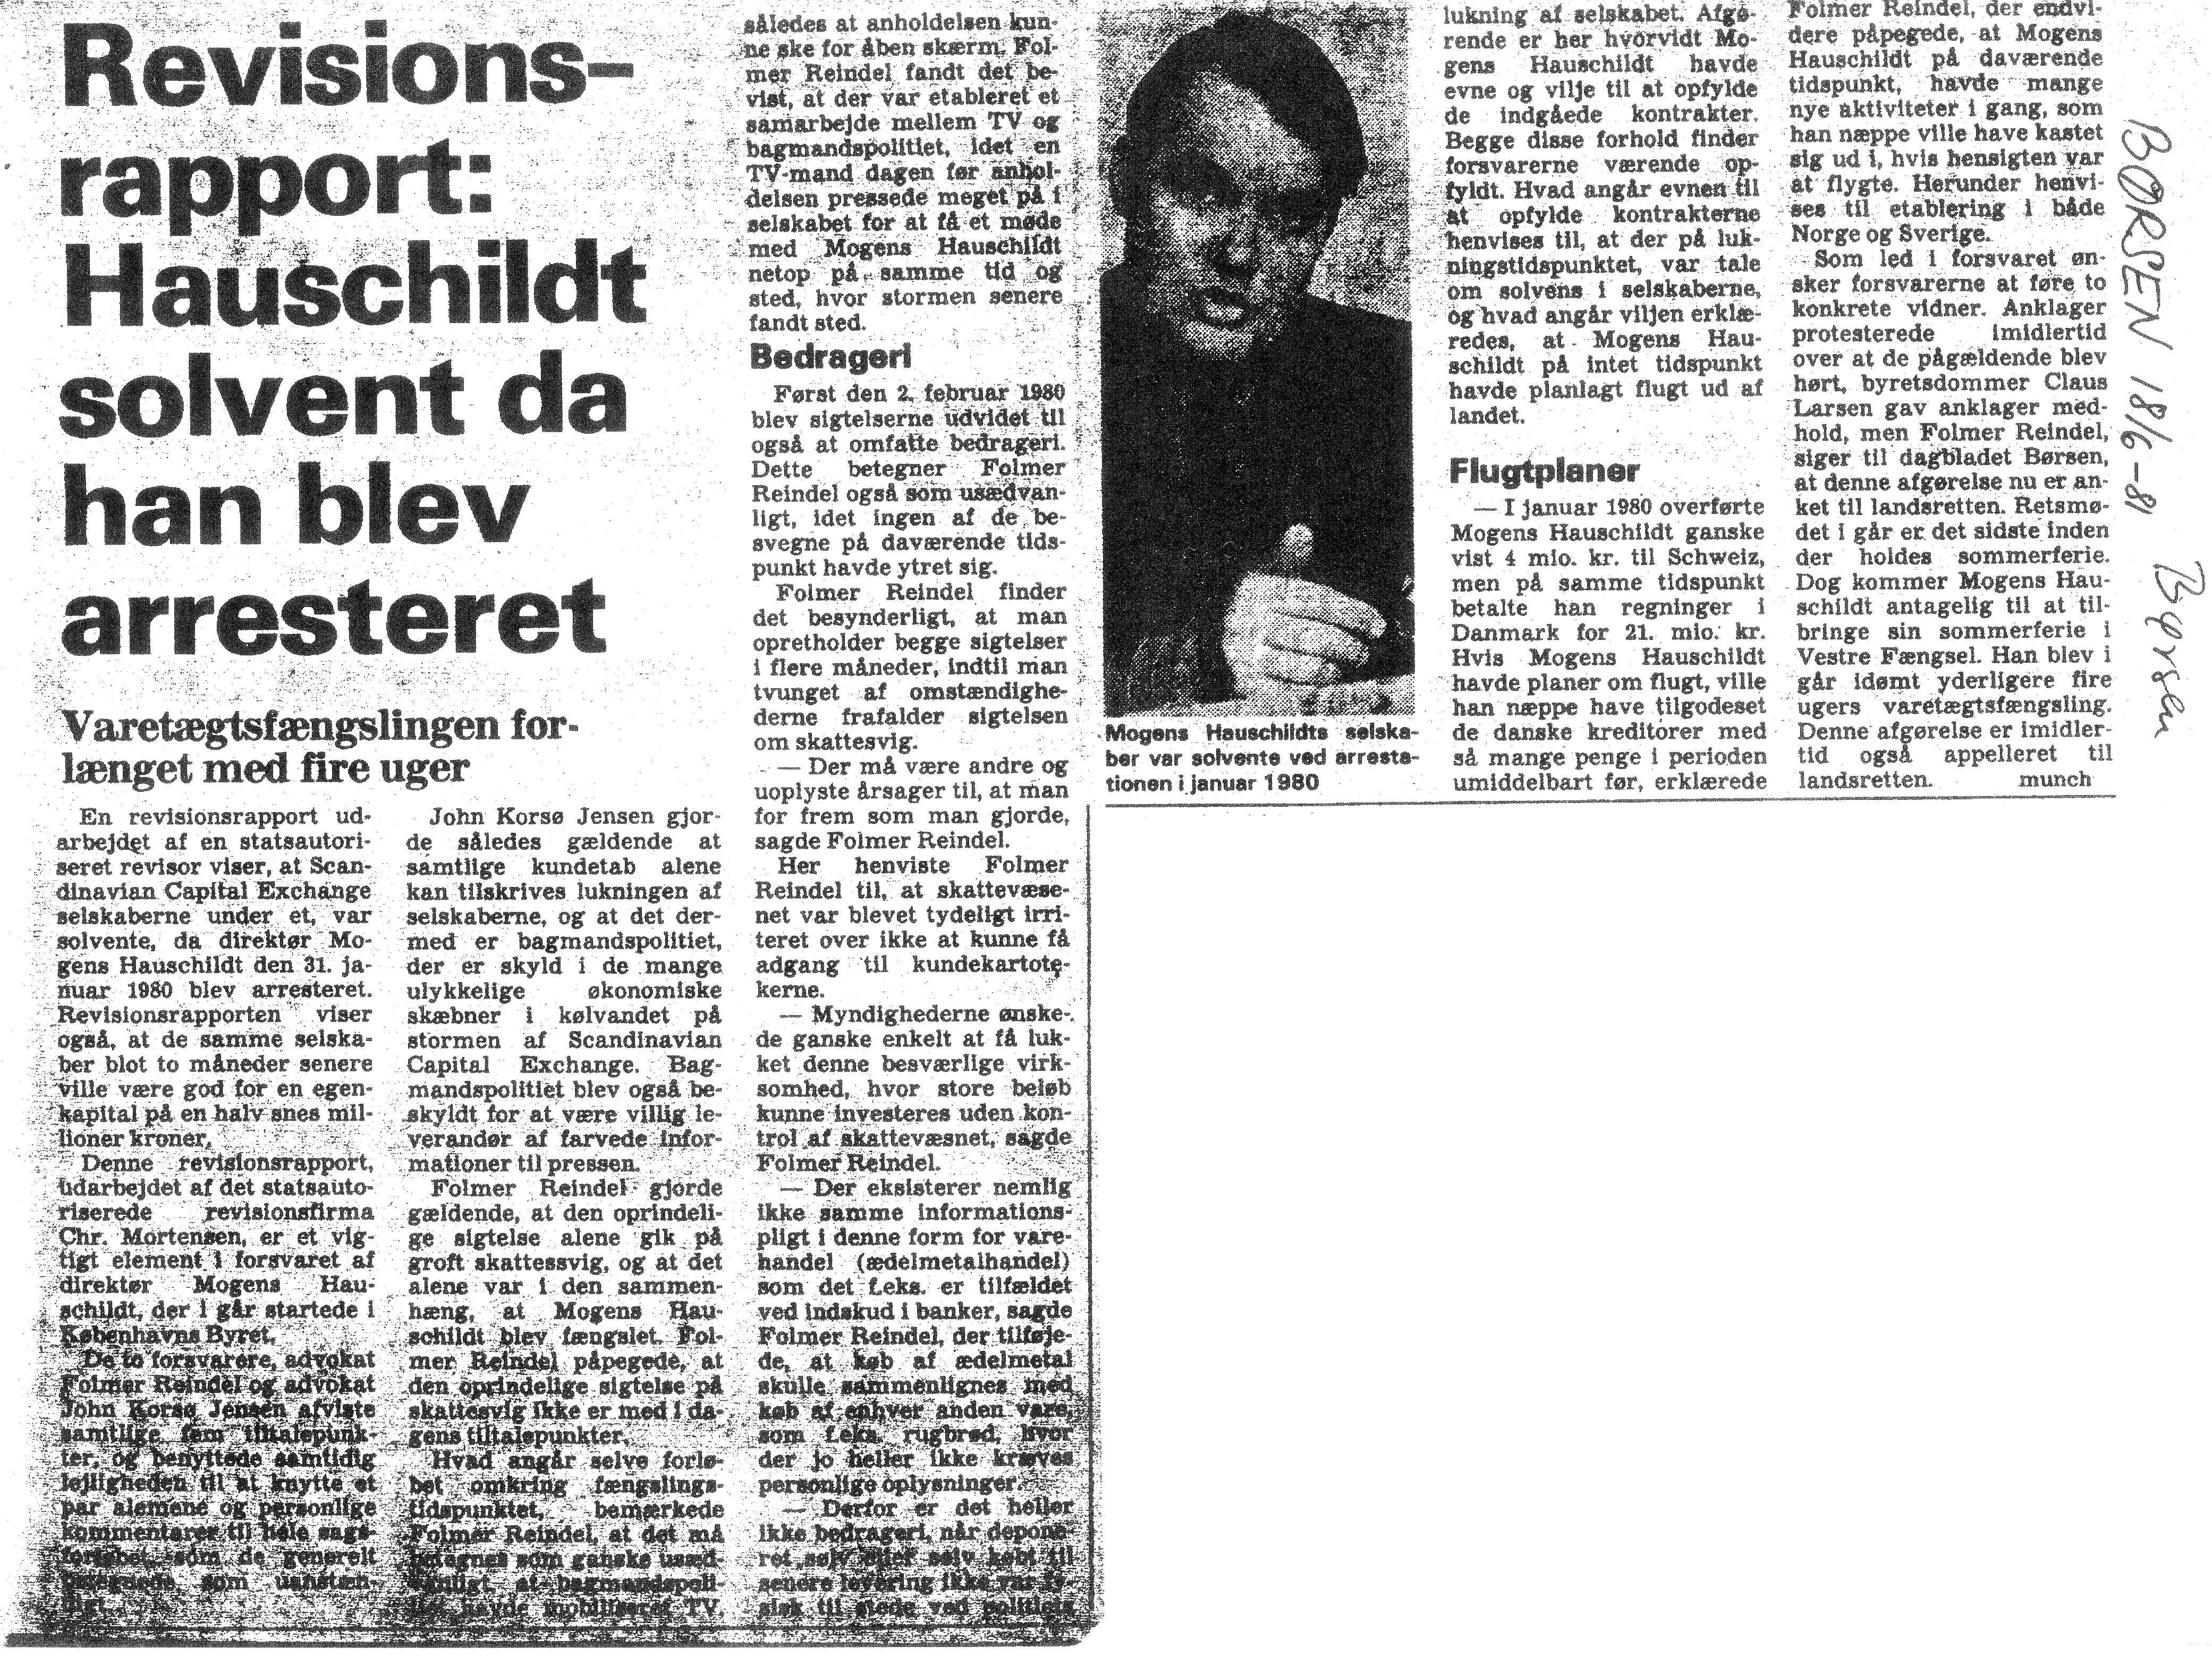 DK-Avis-Borsen-18.June.1981-large